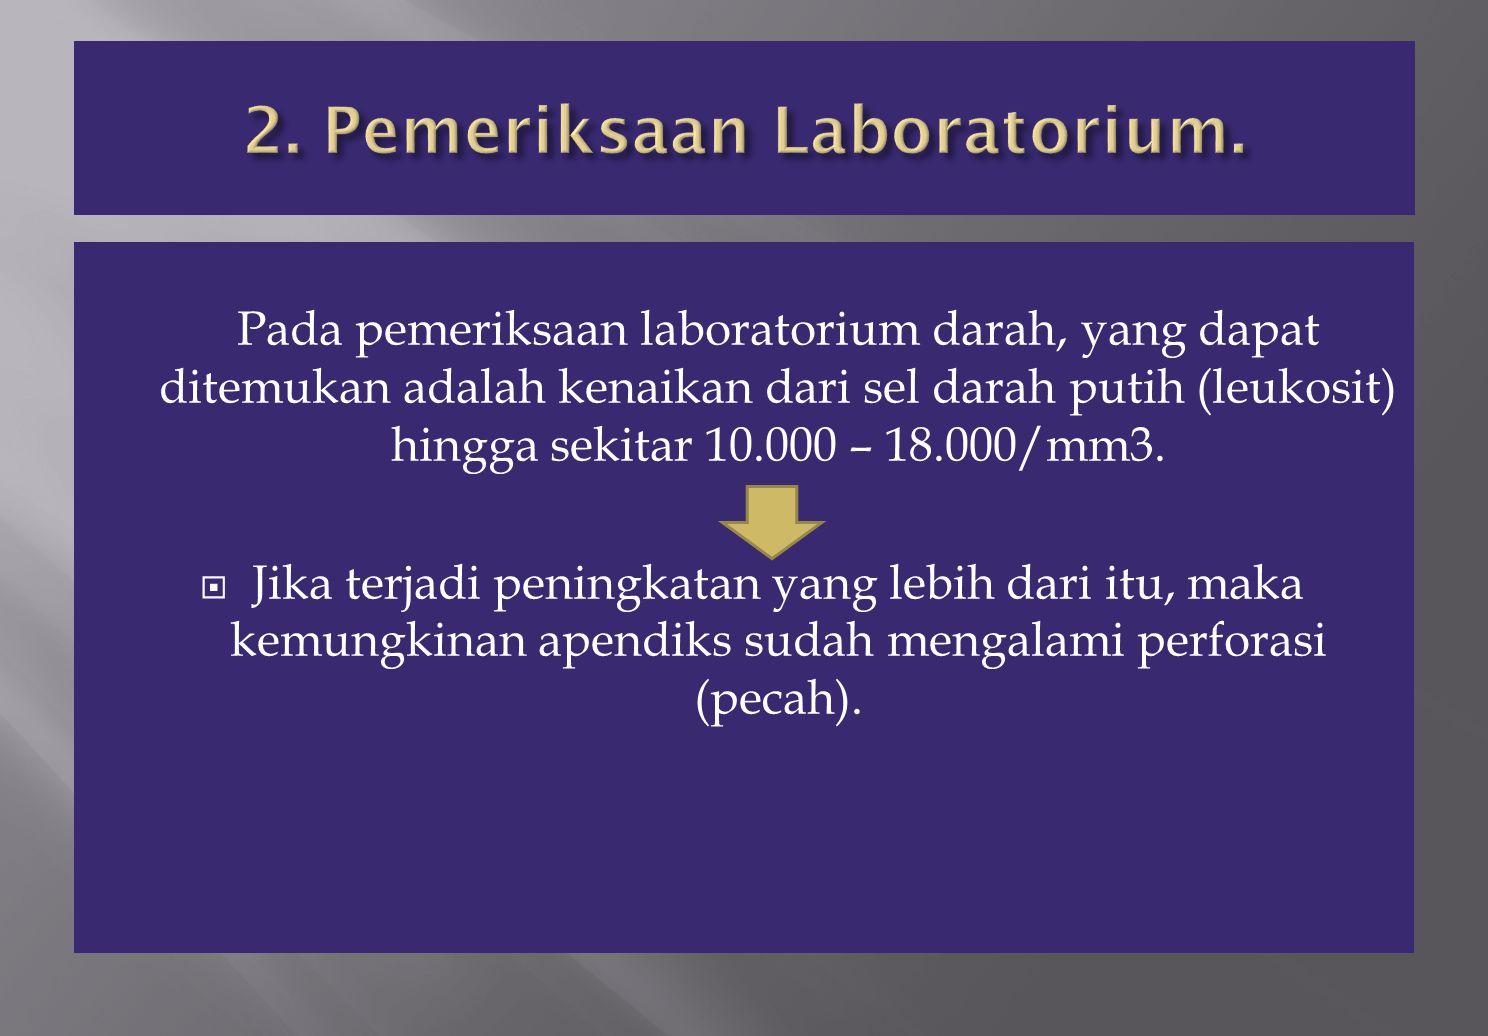 2. Pemeriksaan Laboratorium.